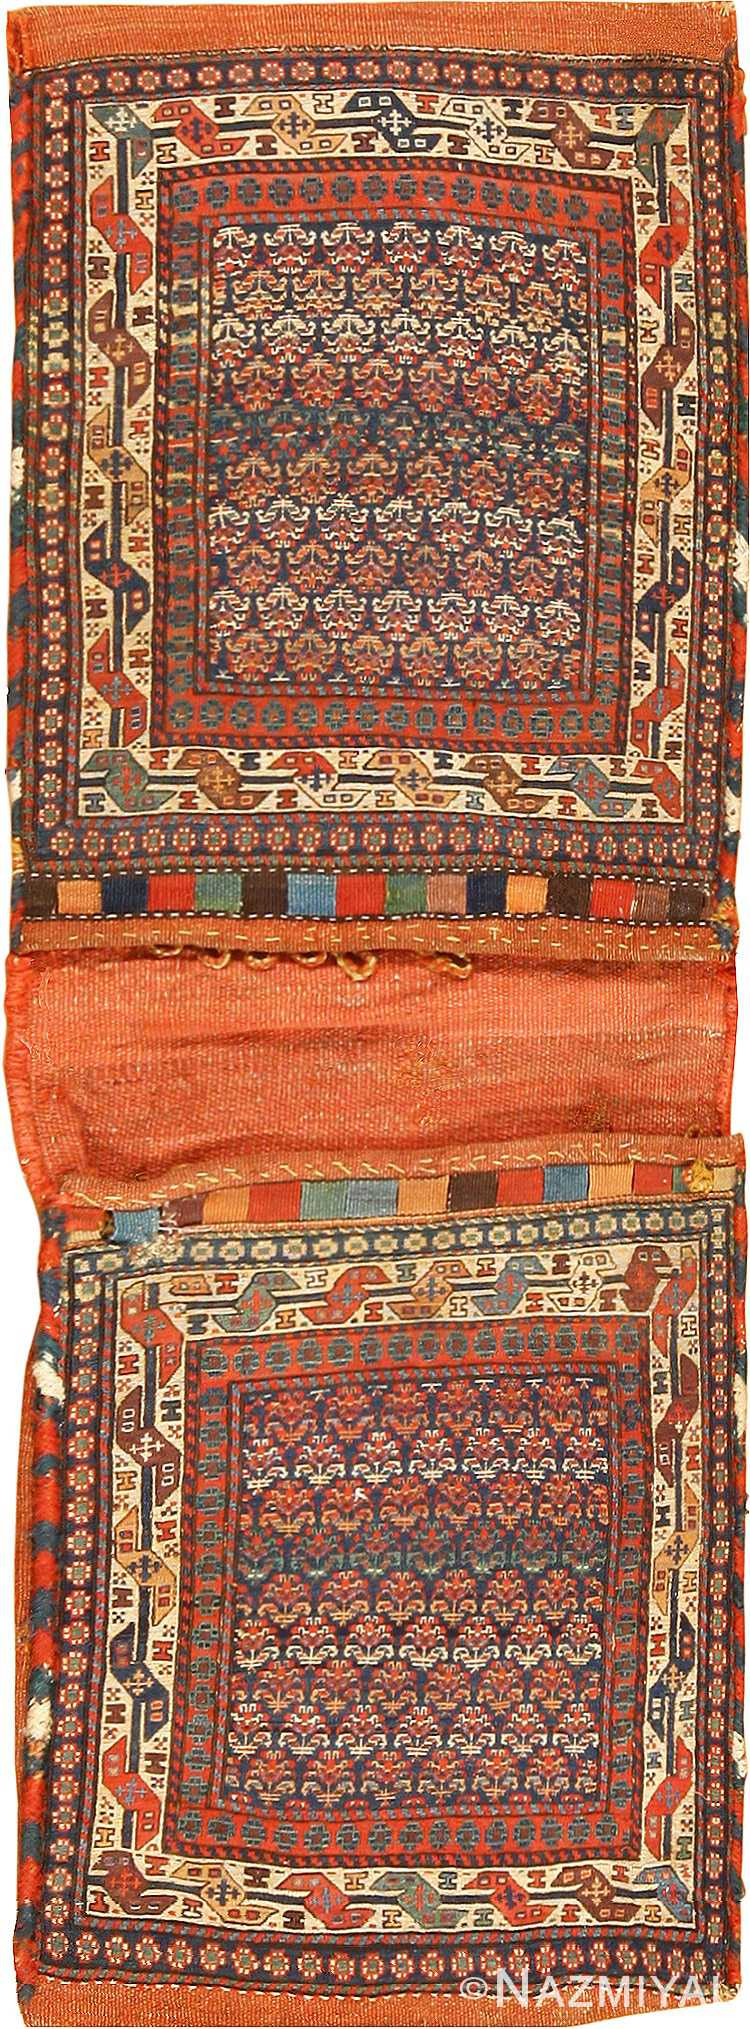 Collectible Antique Persian Shahsavan Bag 59153